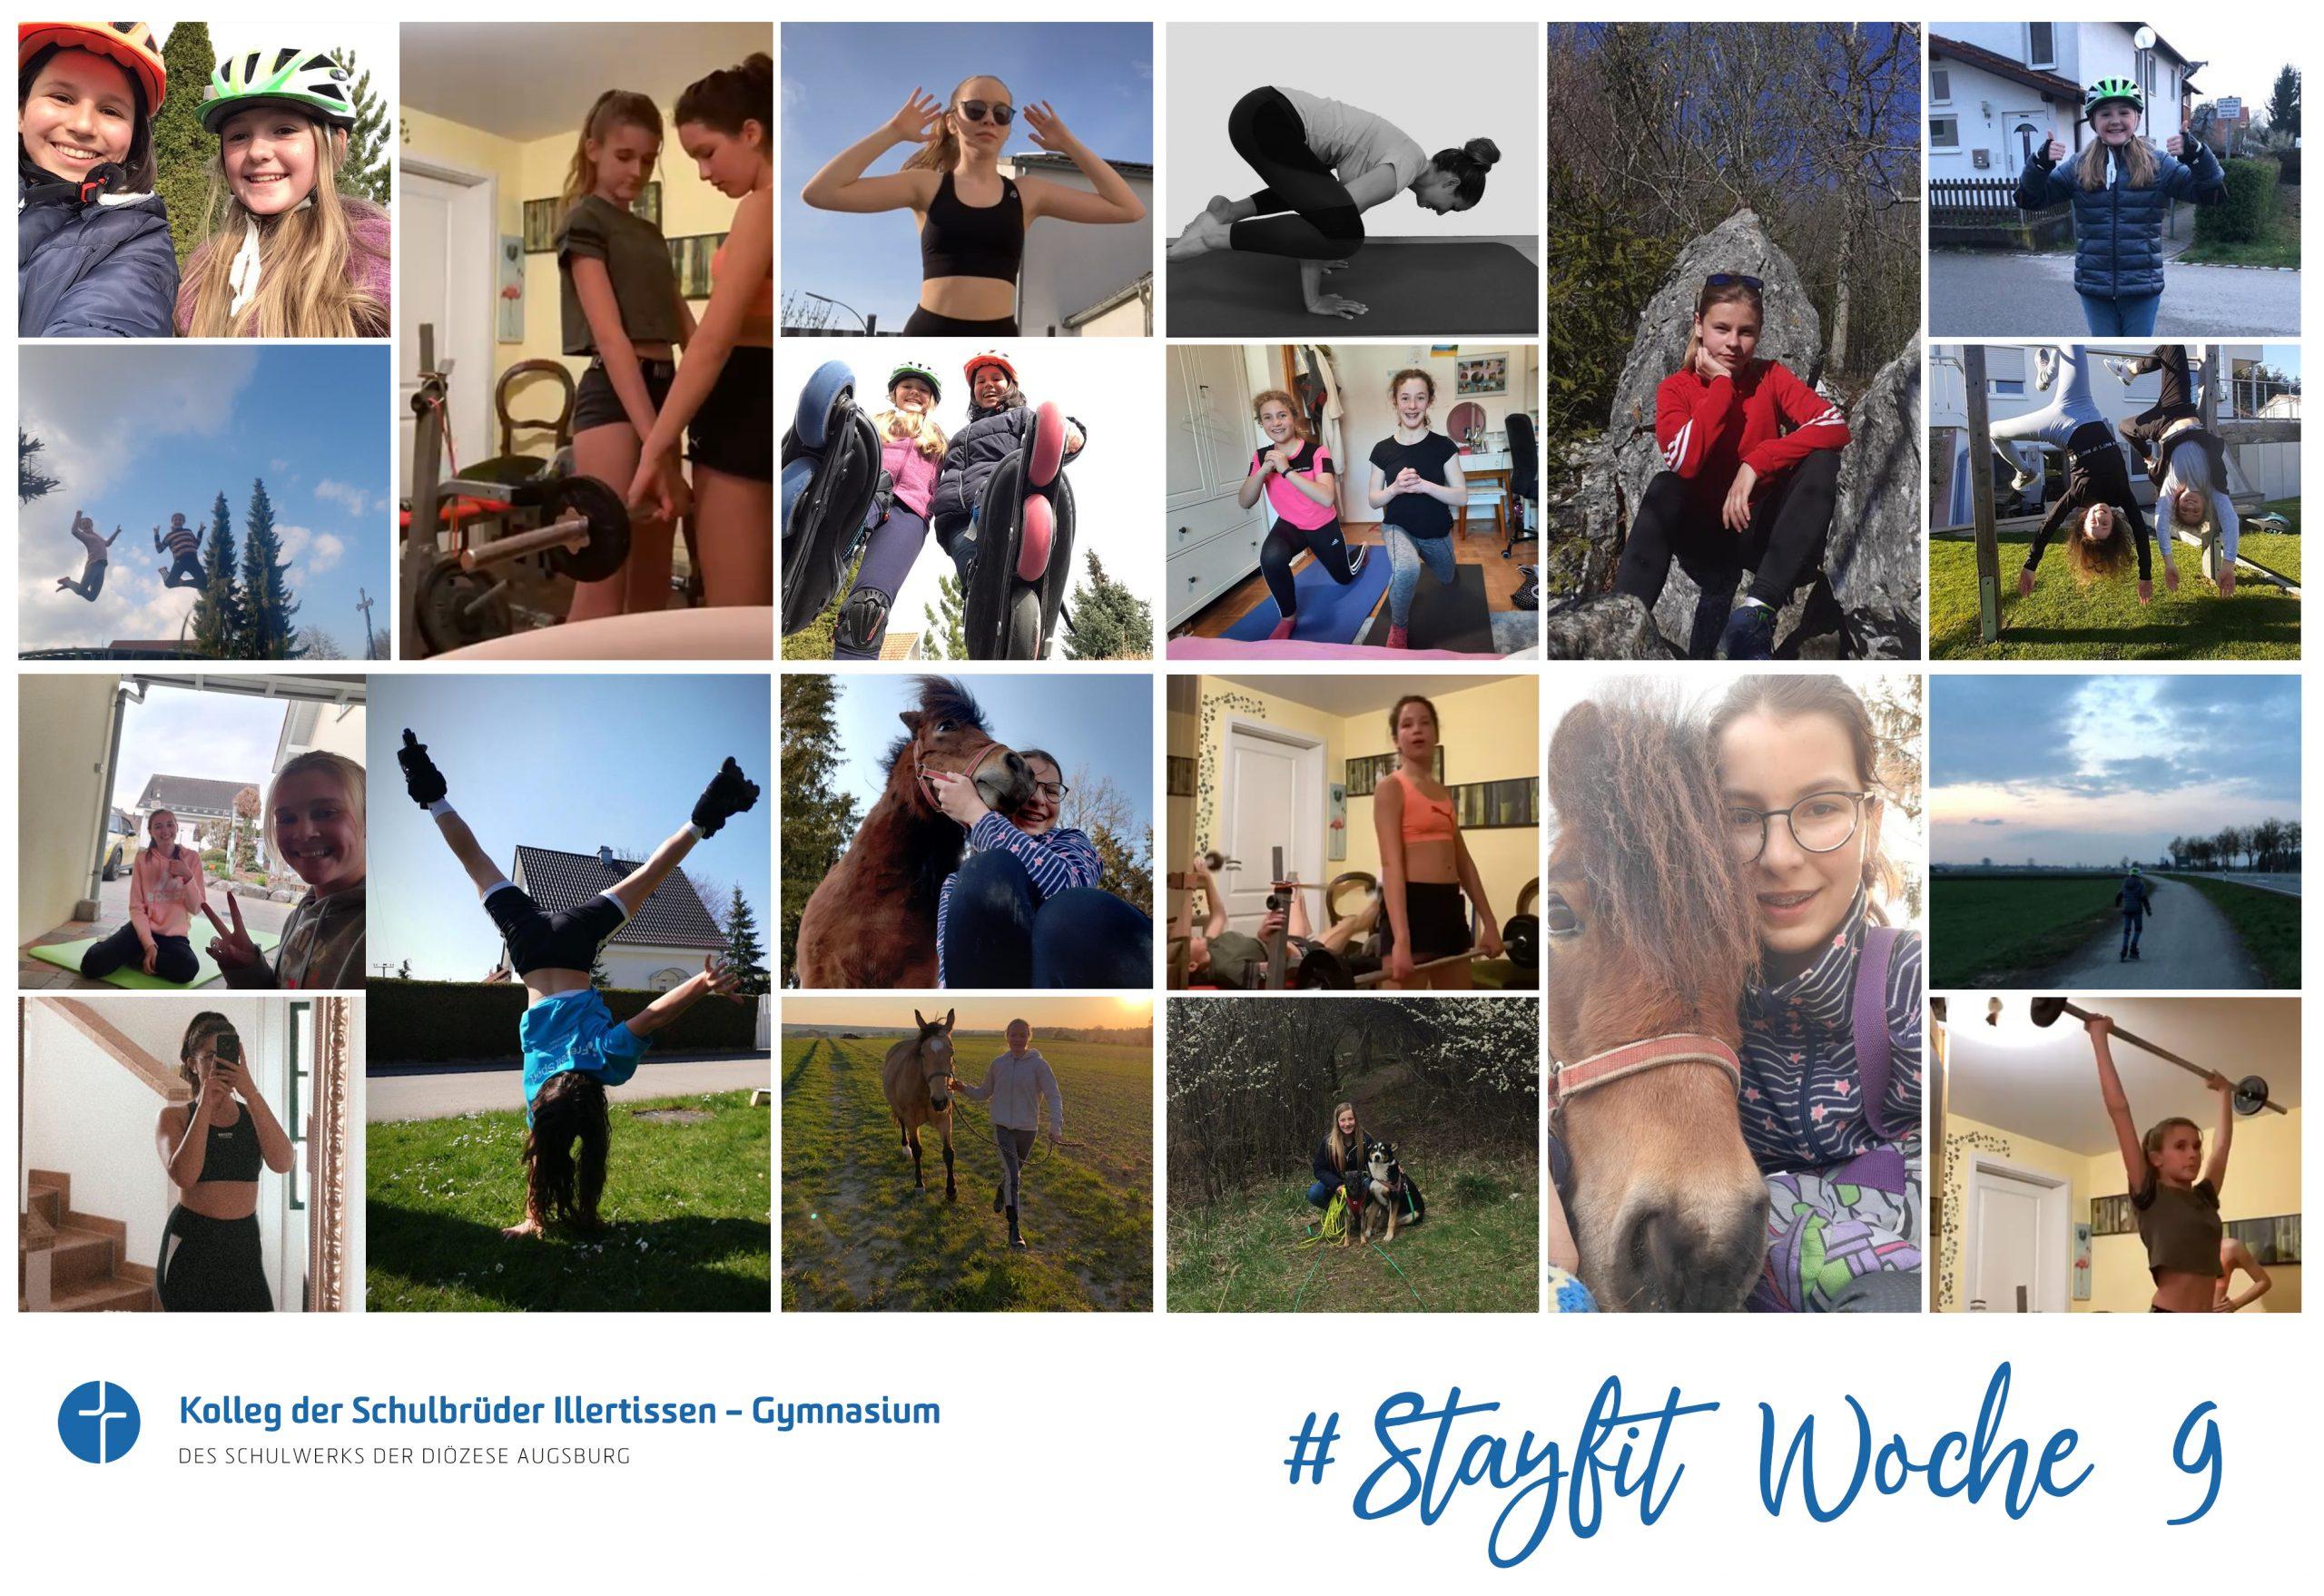 #stayfit Woche 9